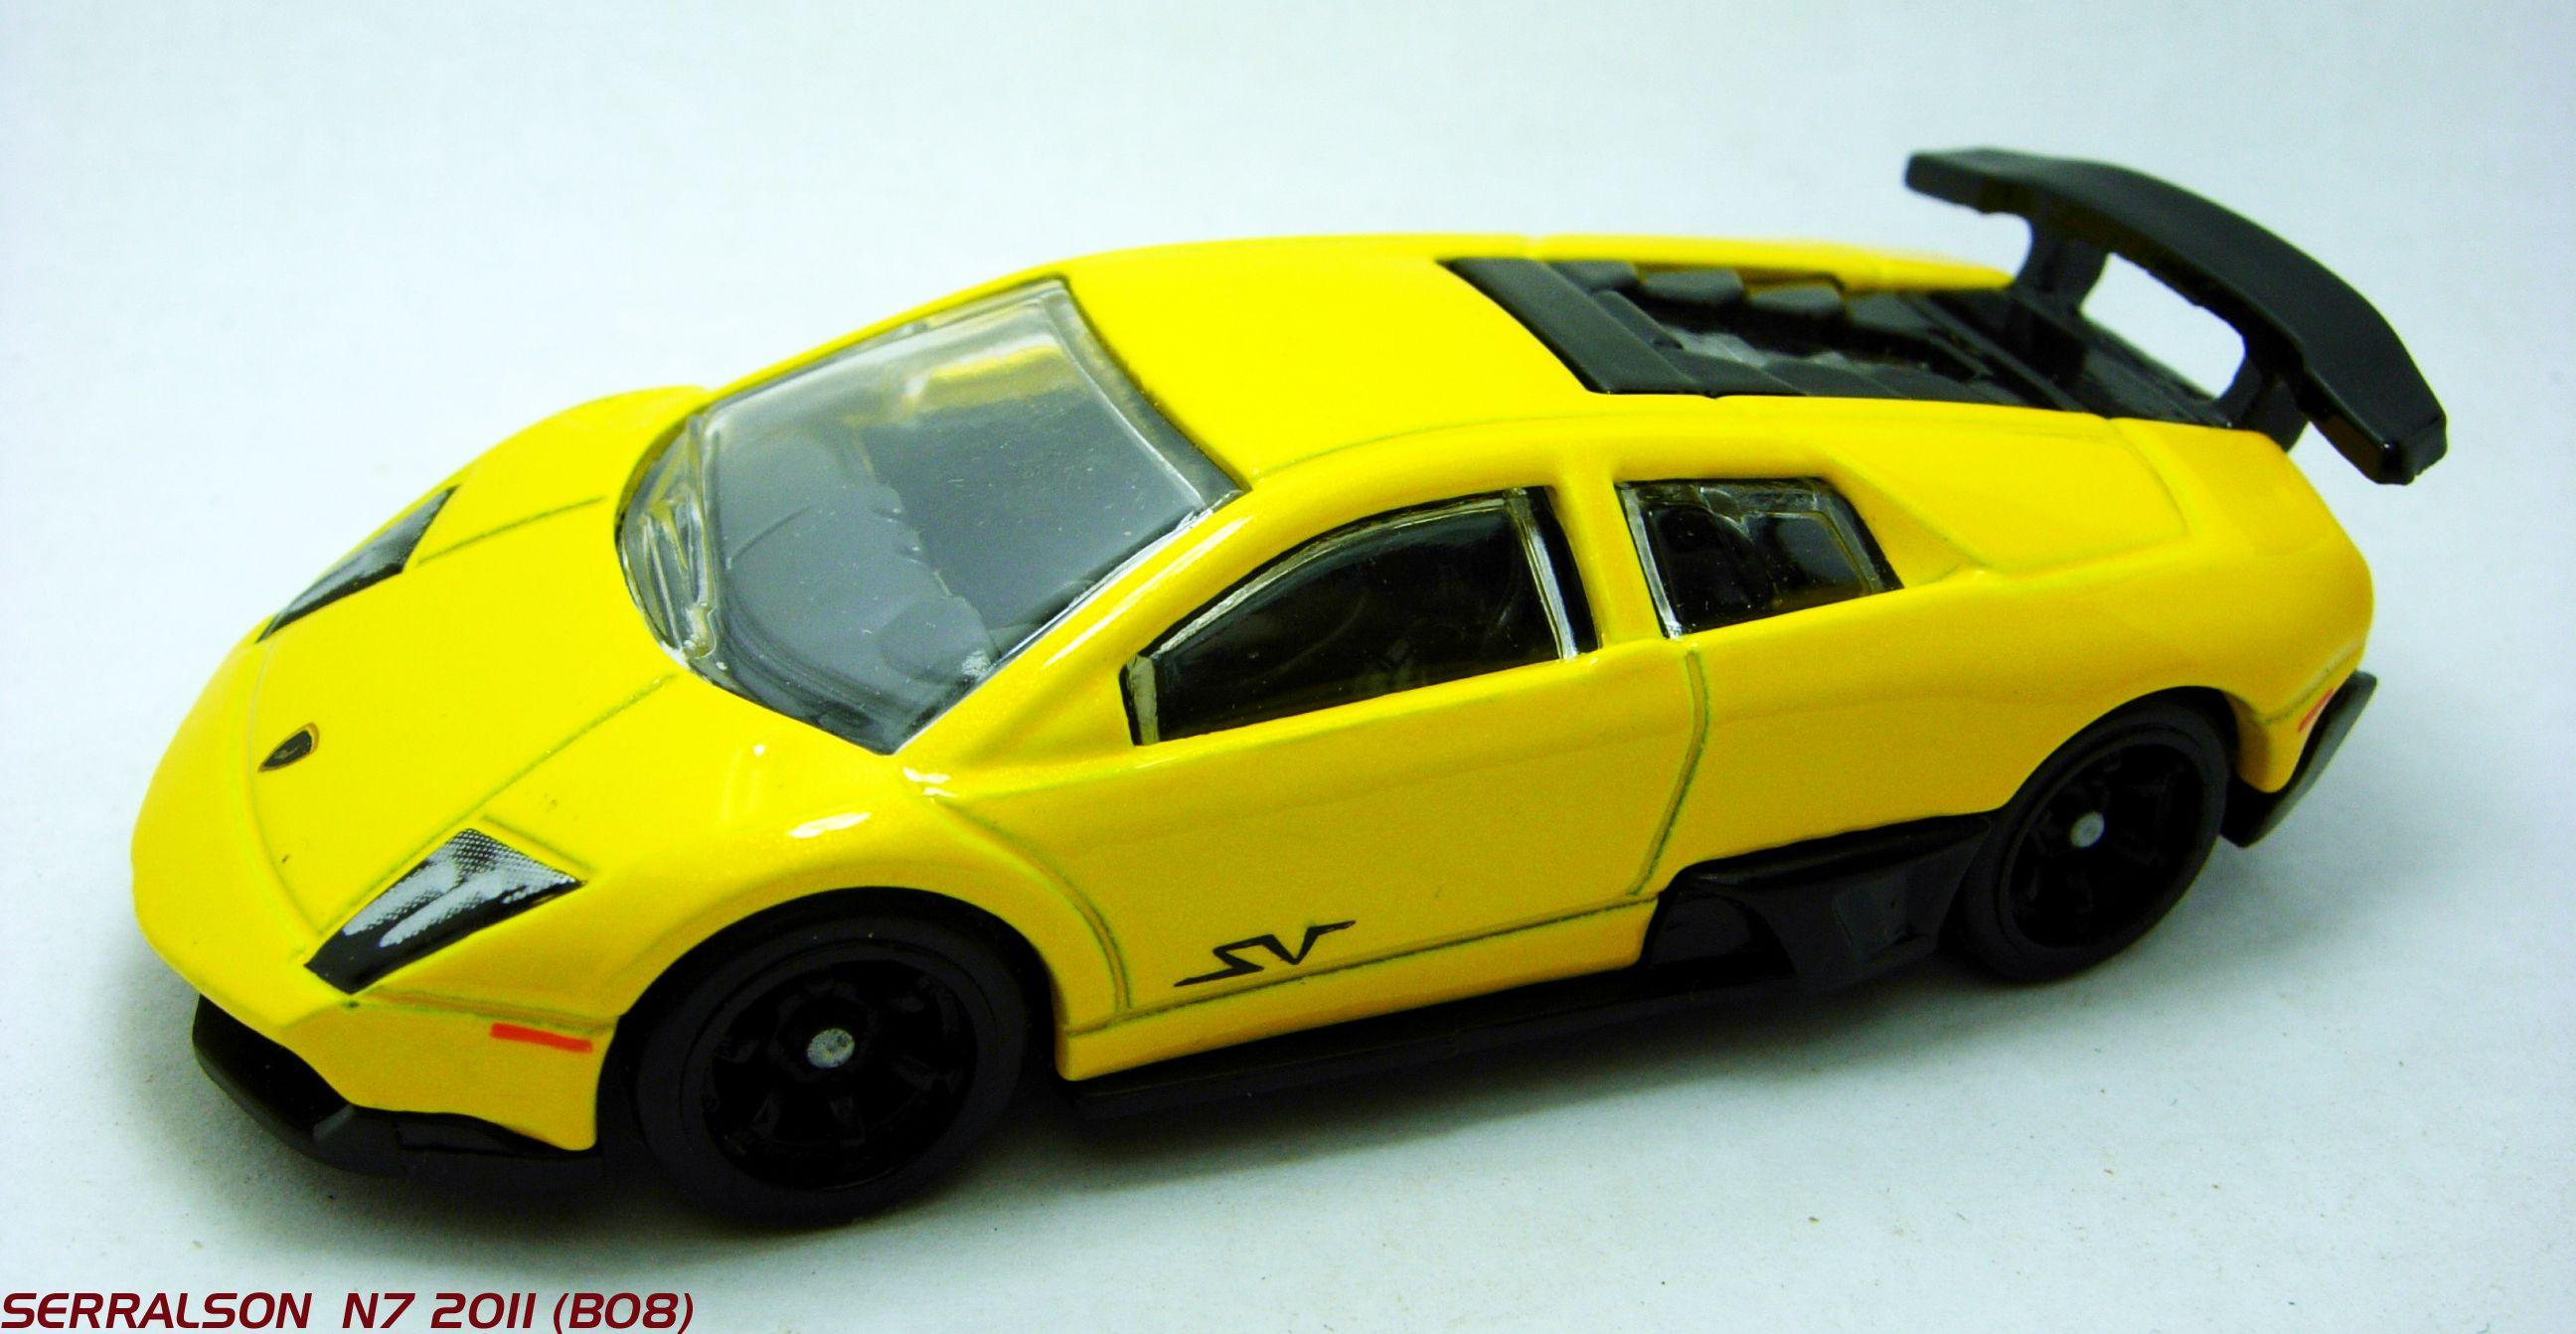 Murciélago LP 6704 SV Hot wheels, Hot